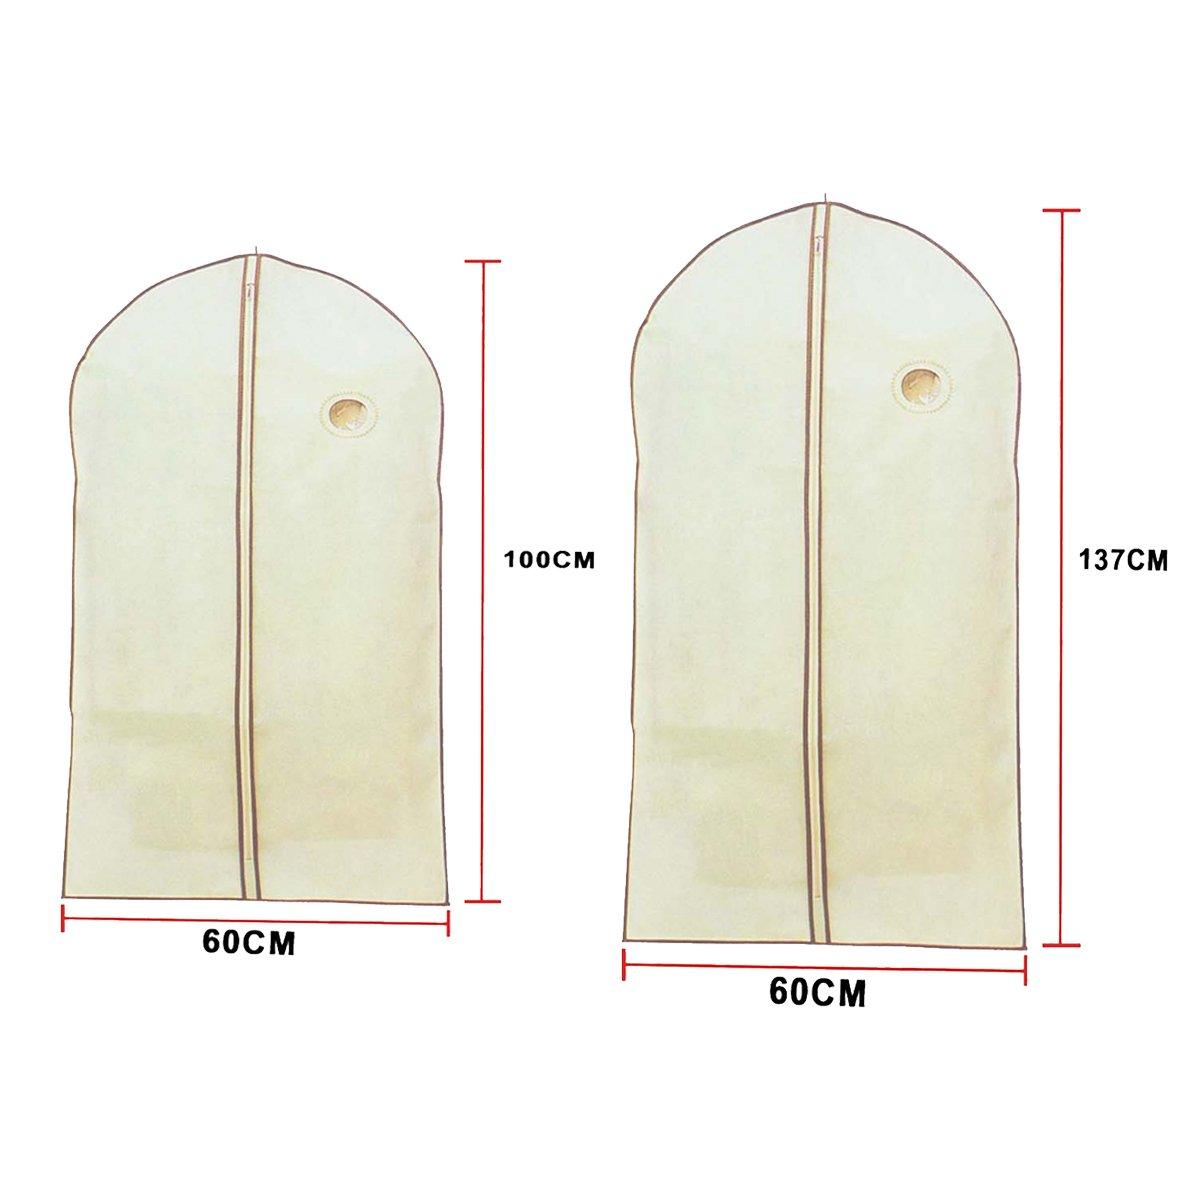 Pack de Dos Fundas Porta Traje Color Beige Medidas de 60x100 y 60x137 cm. Cisne 2013 S.L.